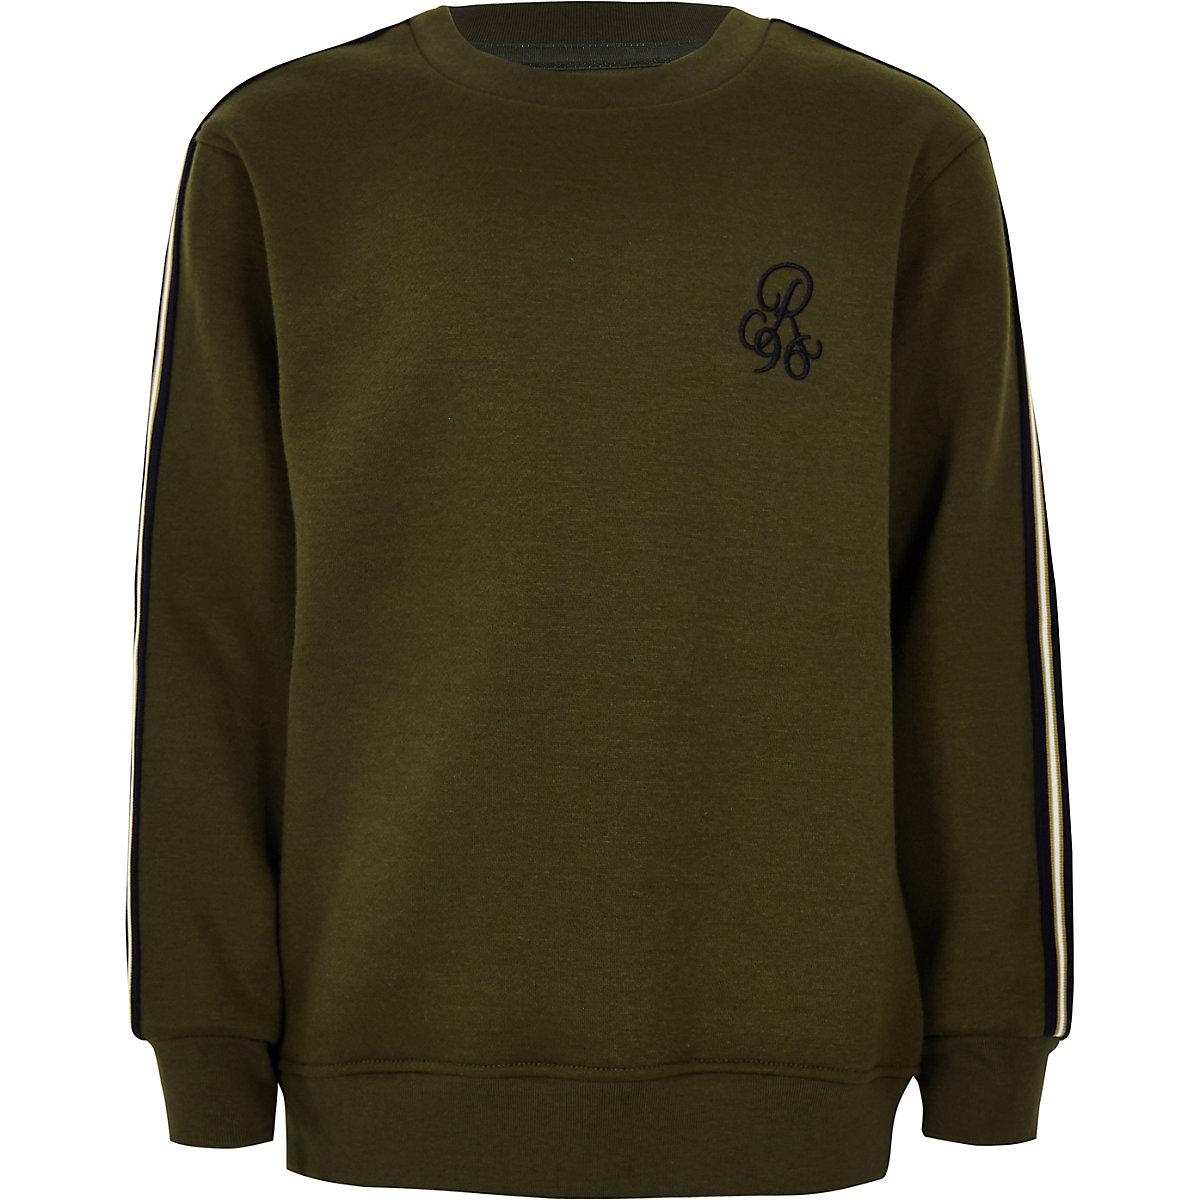 Boys khaki green 'R96' tape side jumper